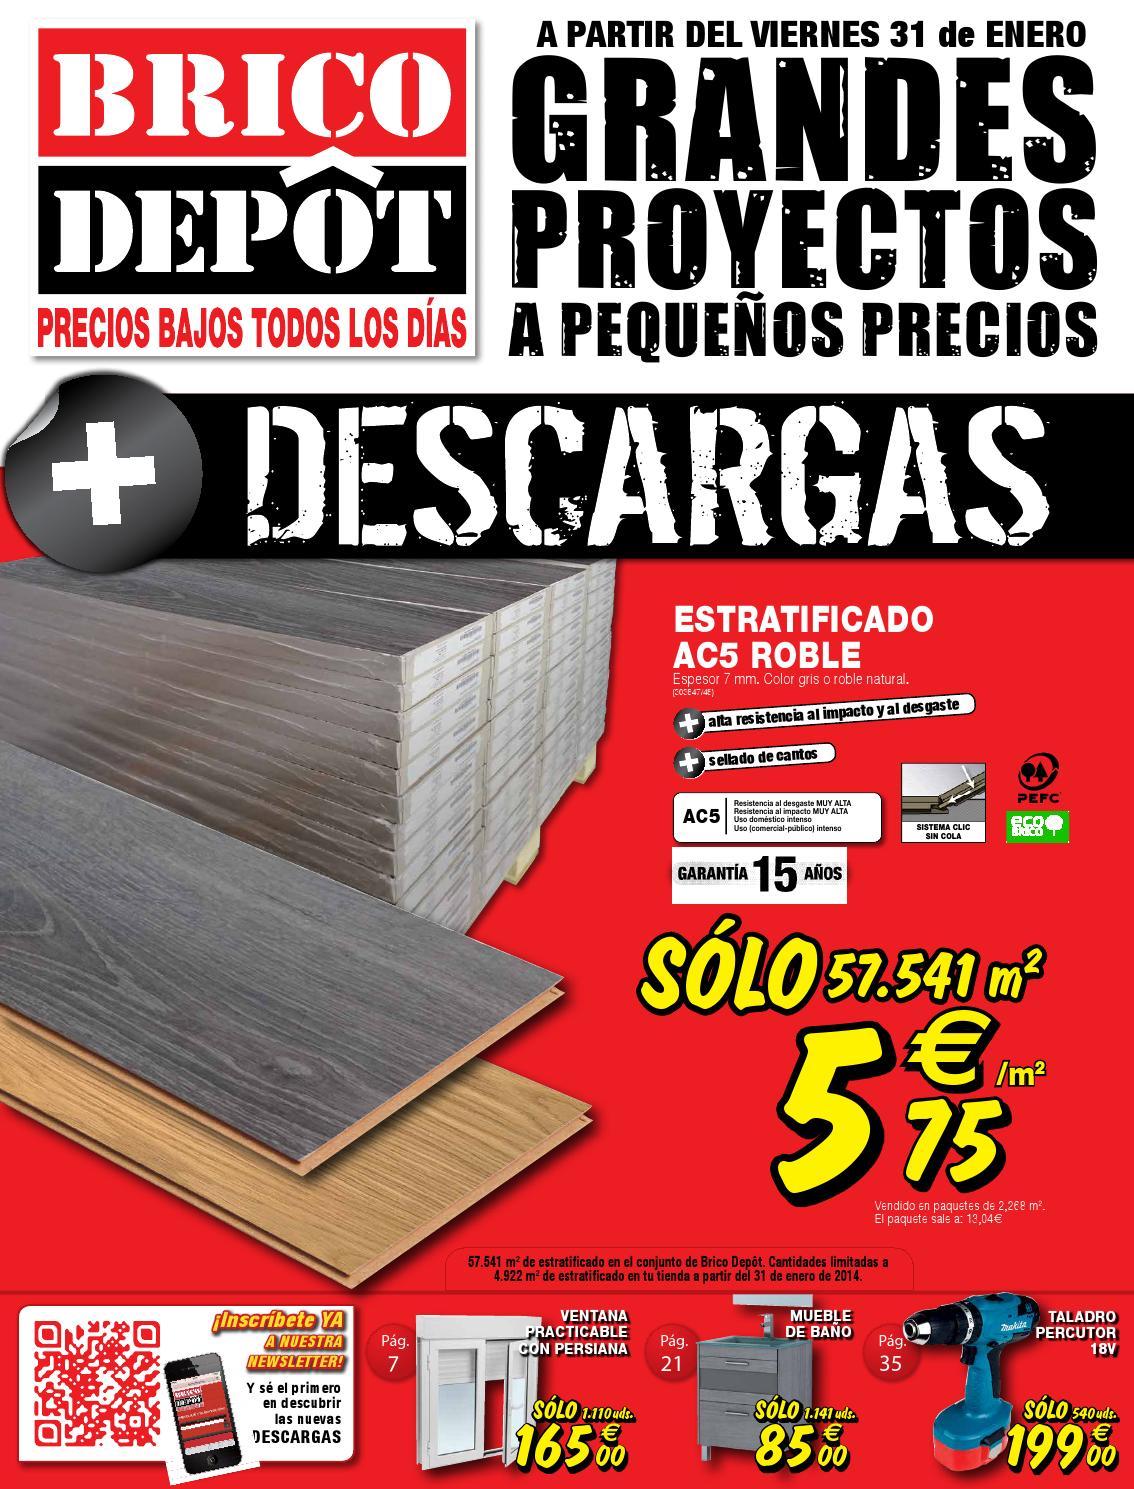 Brico depot toldos flashup flashup flashup flashup with for Bricomart cajoneras armarios